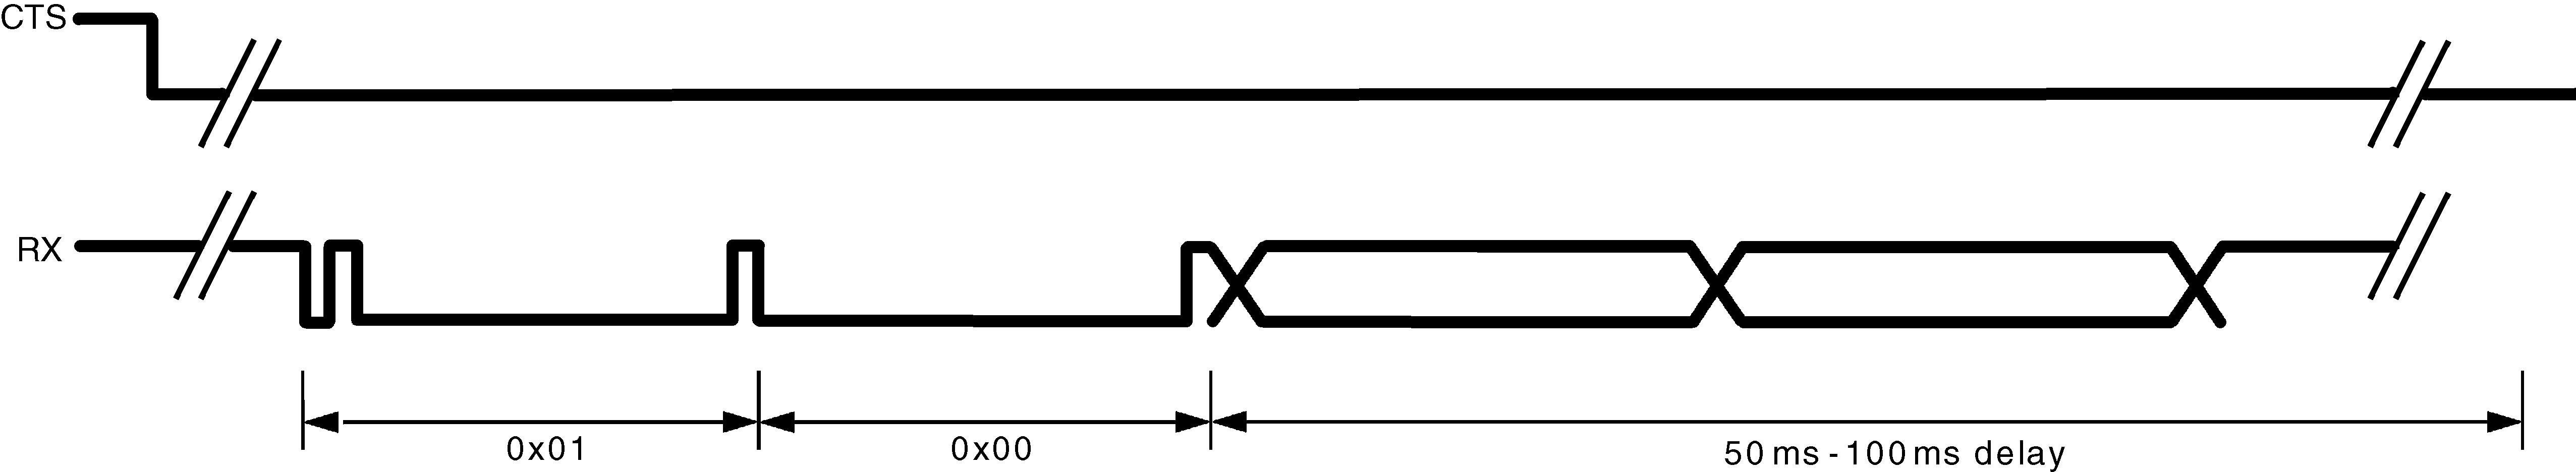 uart timing diagram solex 30 pict 1 lmx9830 データシート bluetooth serial port module tij co jp